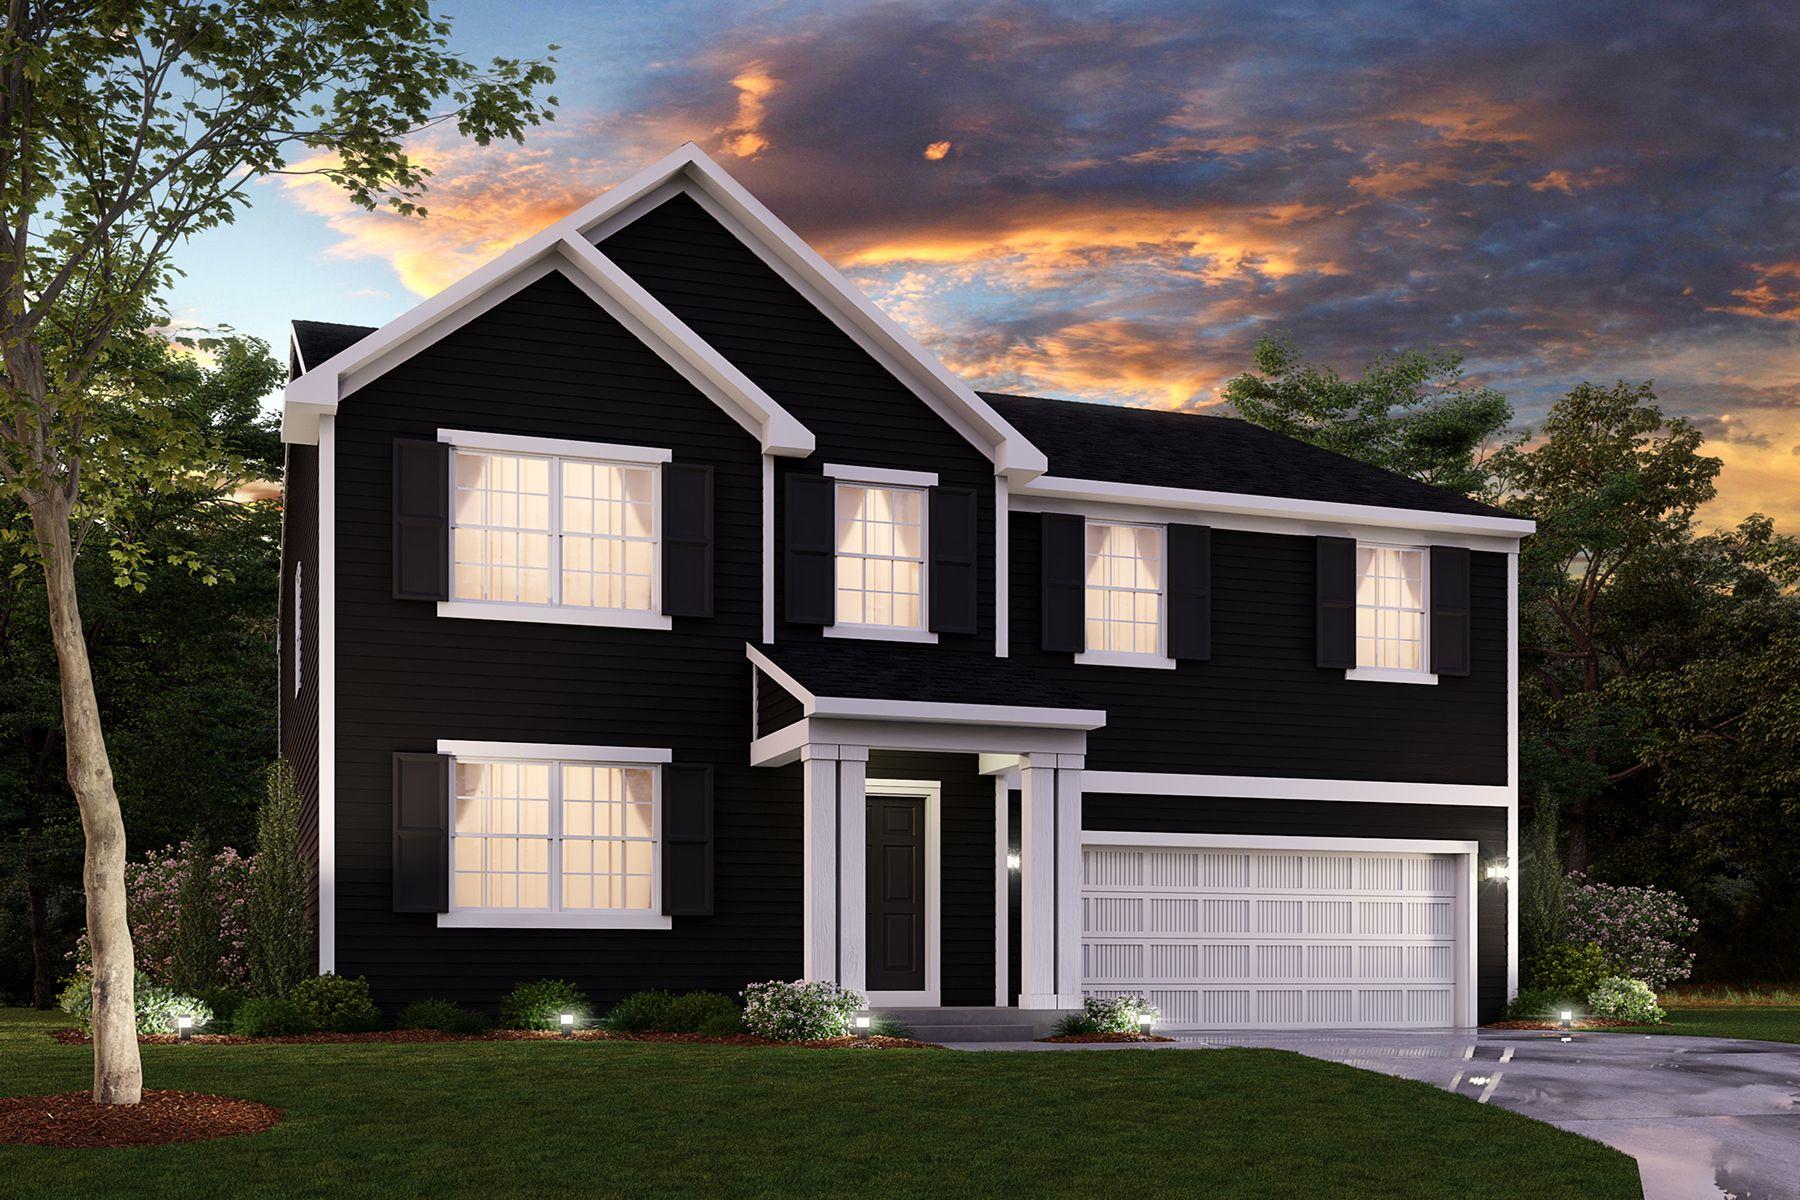 http://partners-dynamic.bdxcdn.com/Images/Homes/MIHomesCorp/max1500_41869549-200226.jpg